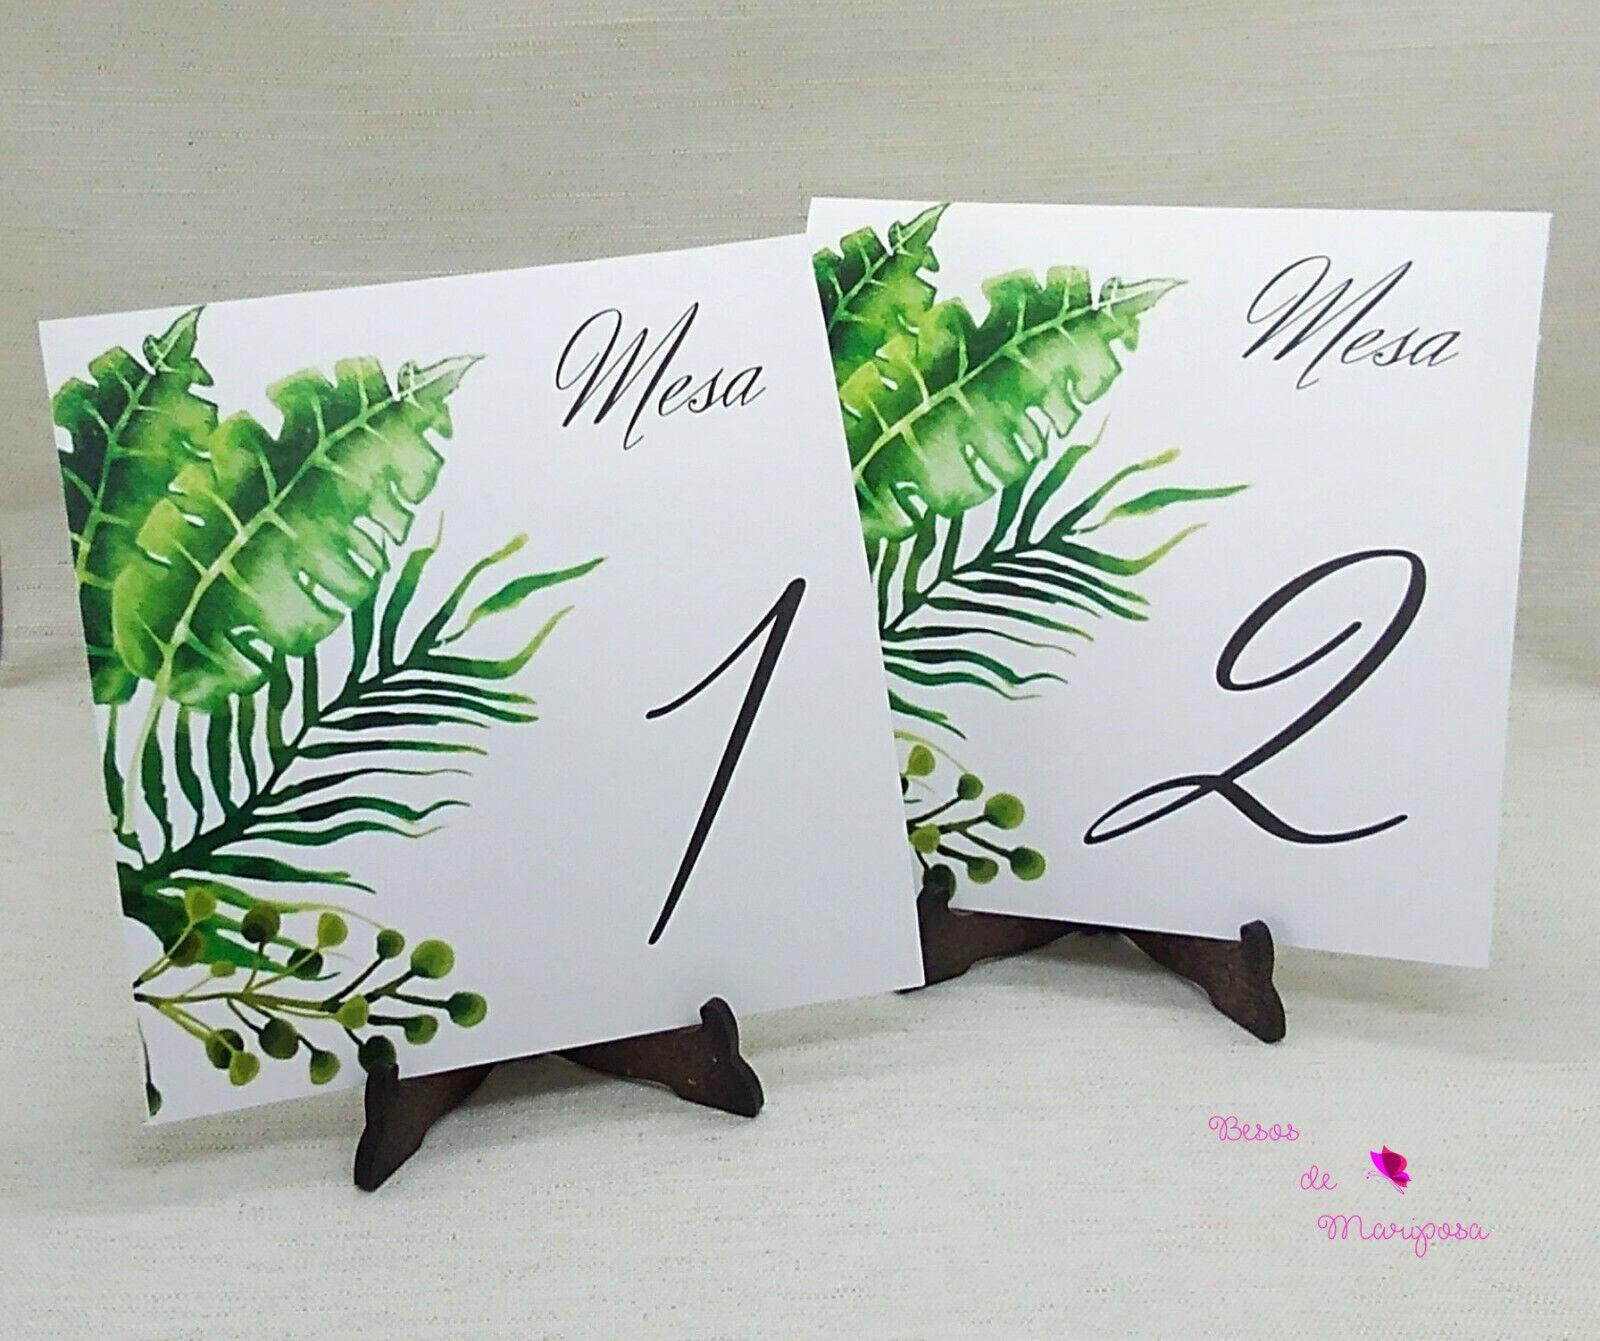 Número de mesa para boda. tarjeta on el número de mesa. 10...